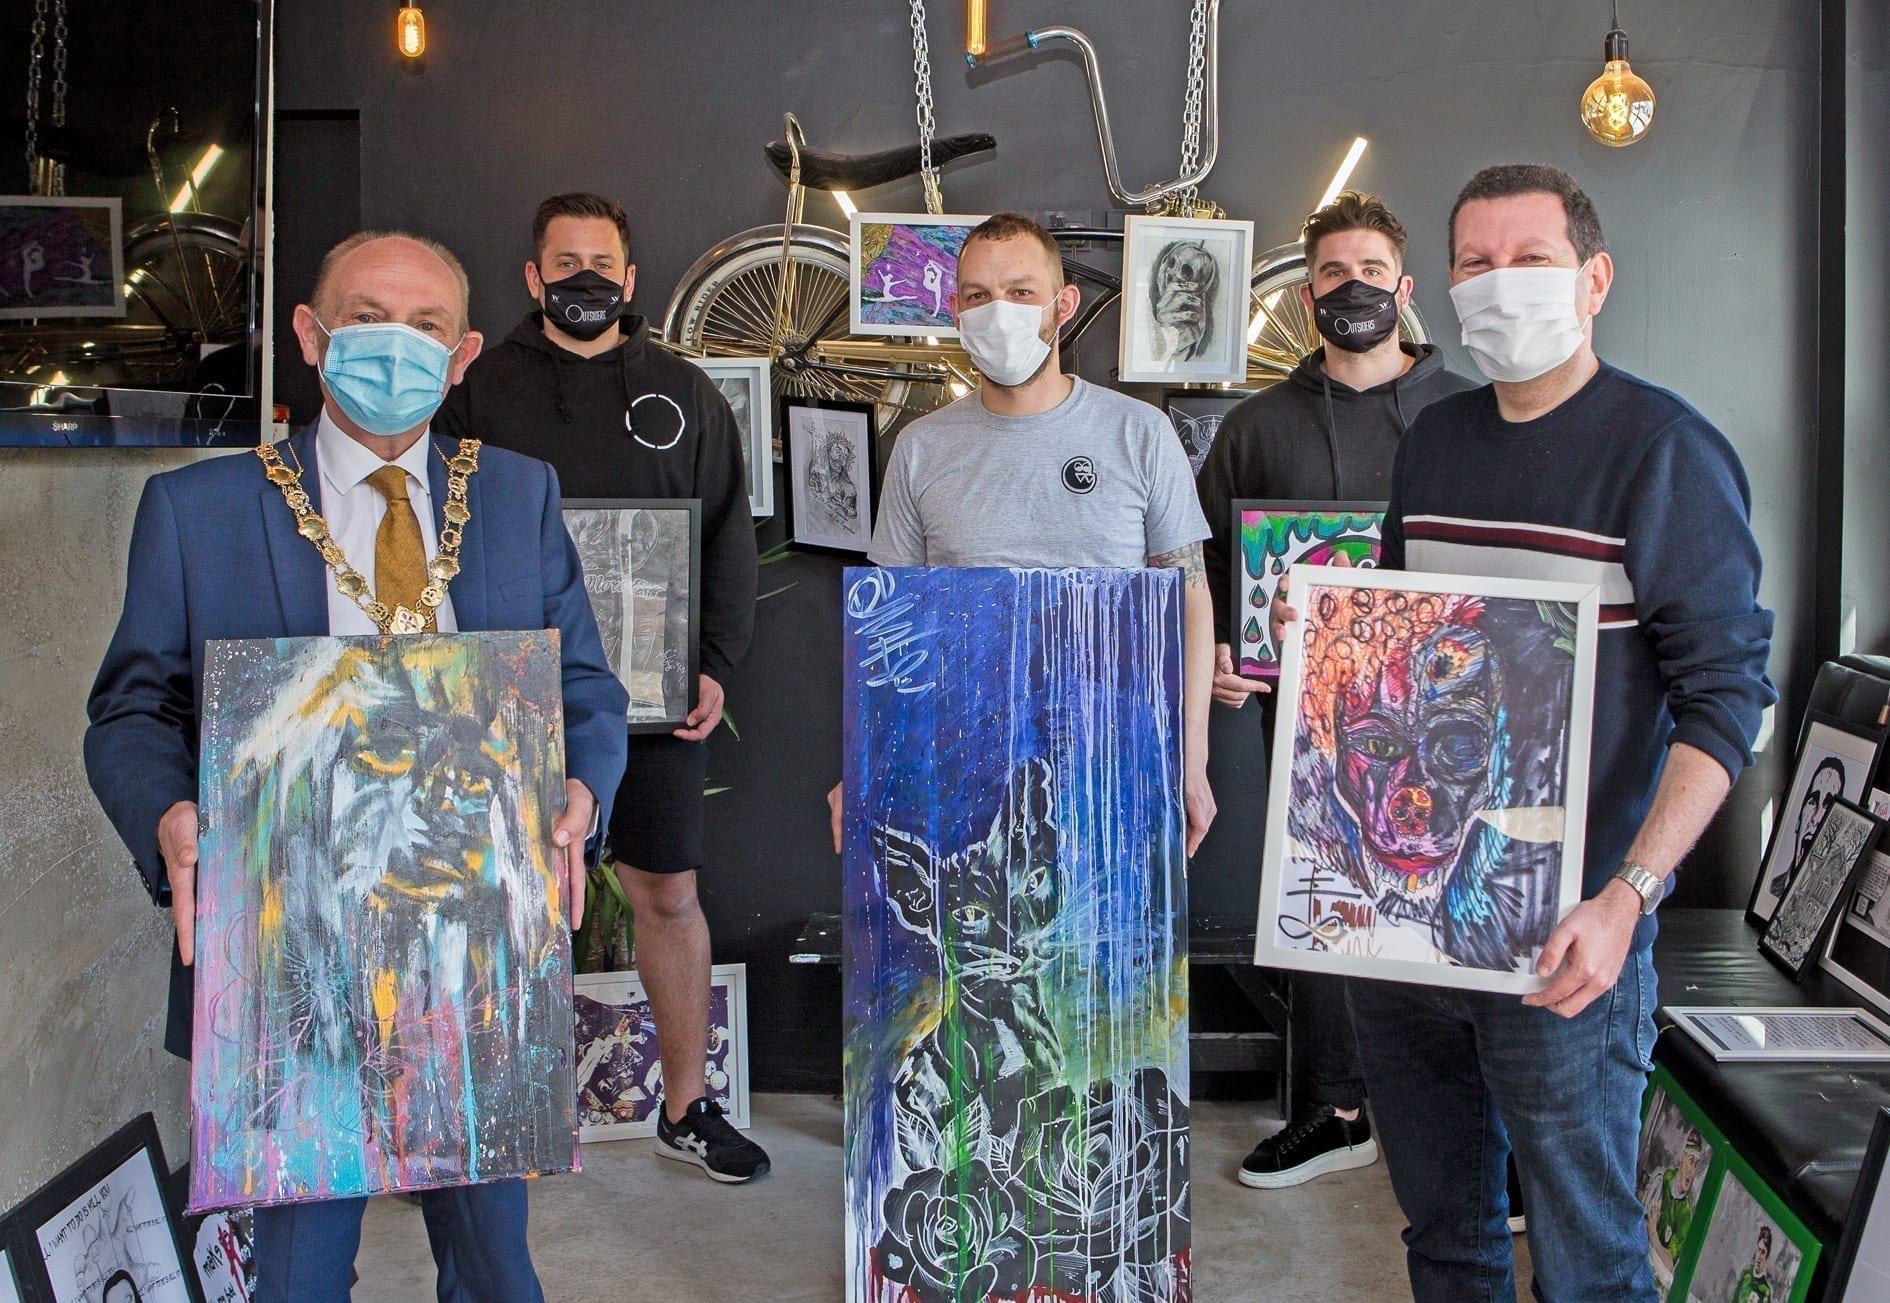 Mental health art exhibition in memory of Bangor man